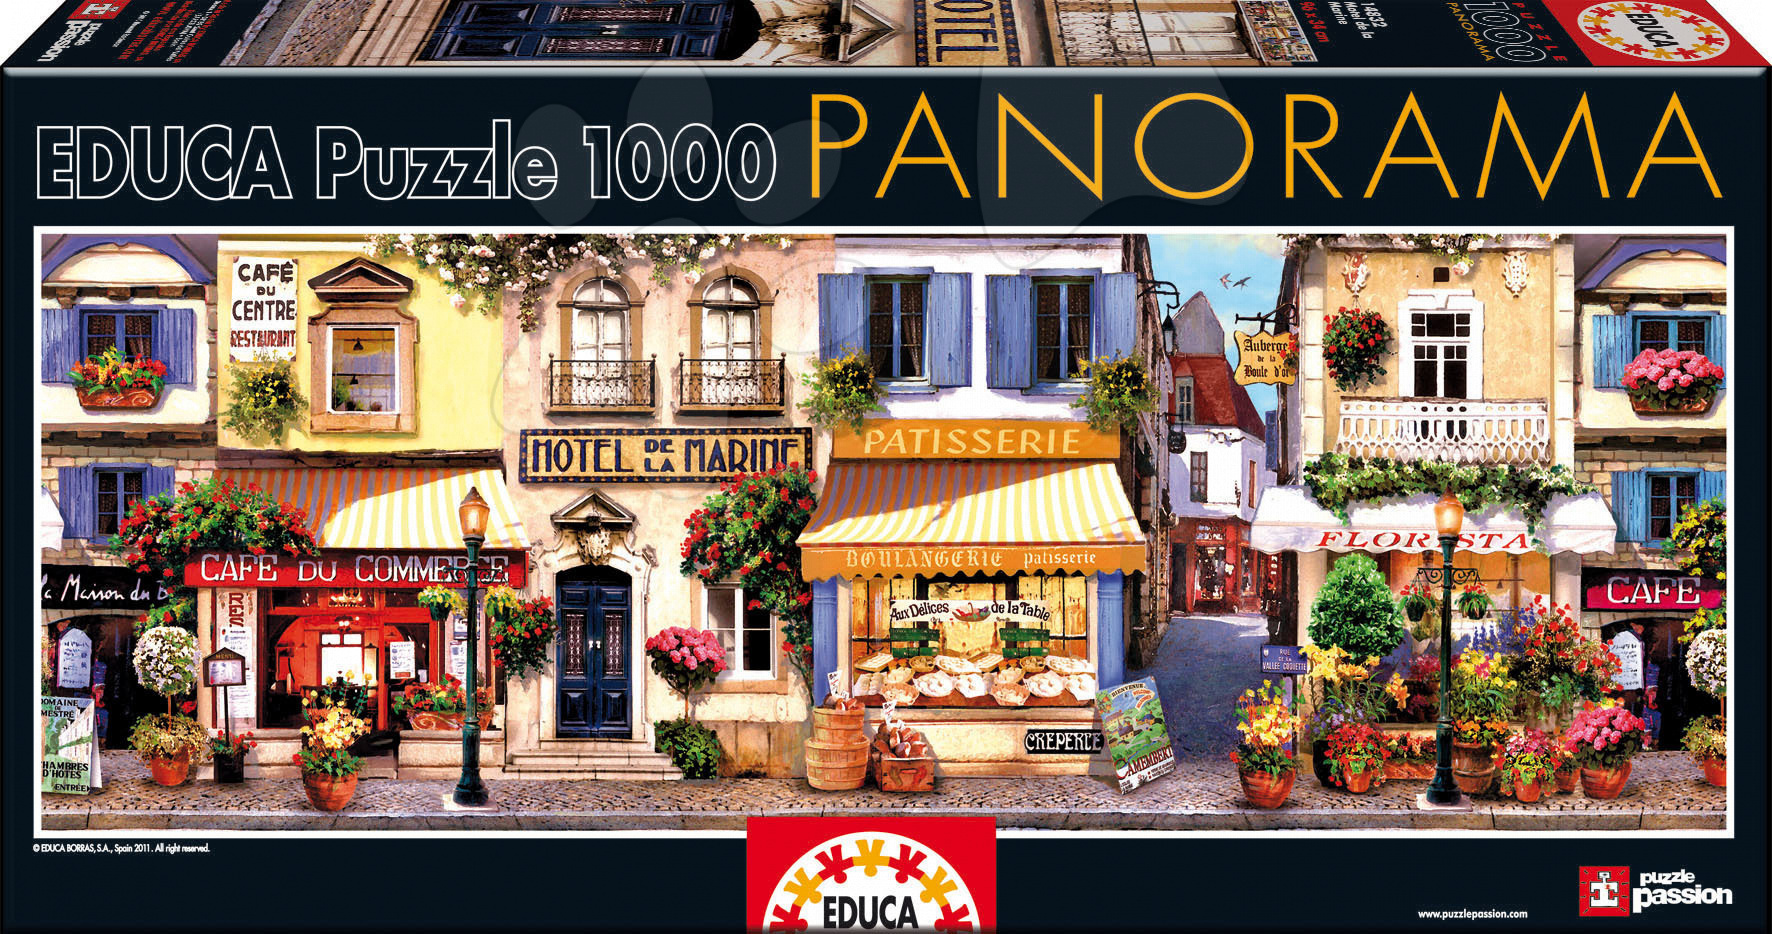 Panorama puzzle - Puzzle Panorama Motel de La Marine Educa 1000 dílů od 12 let